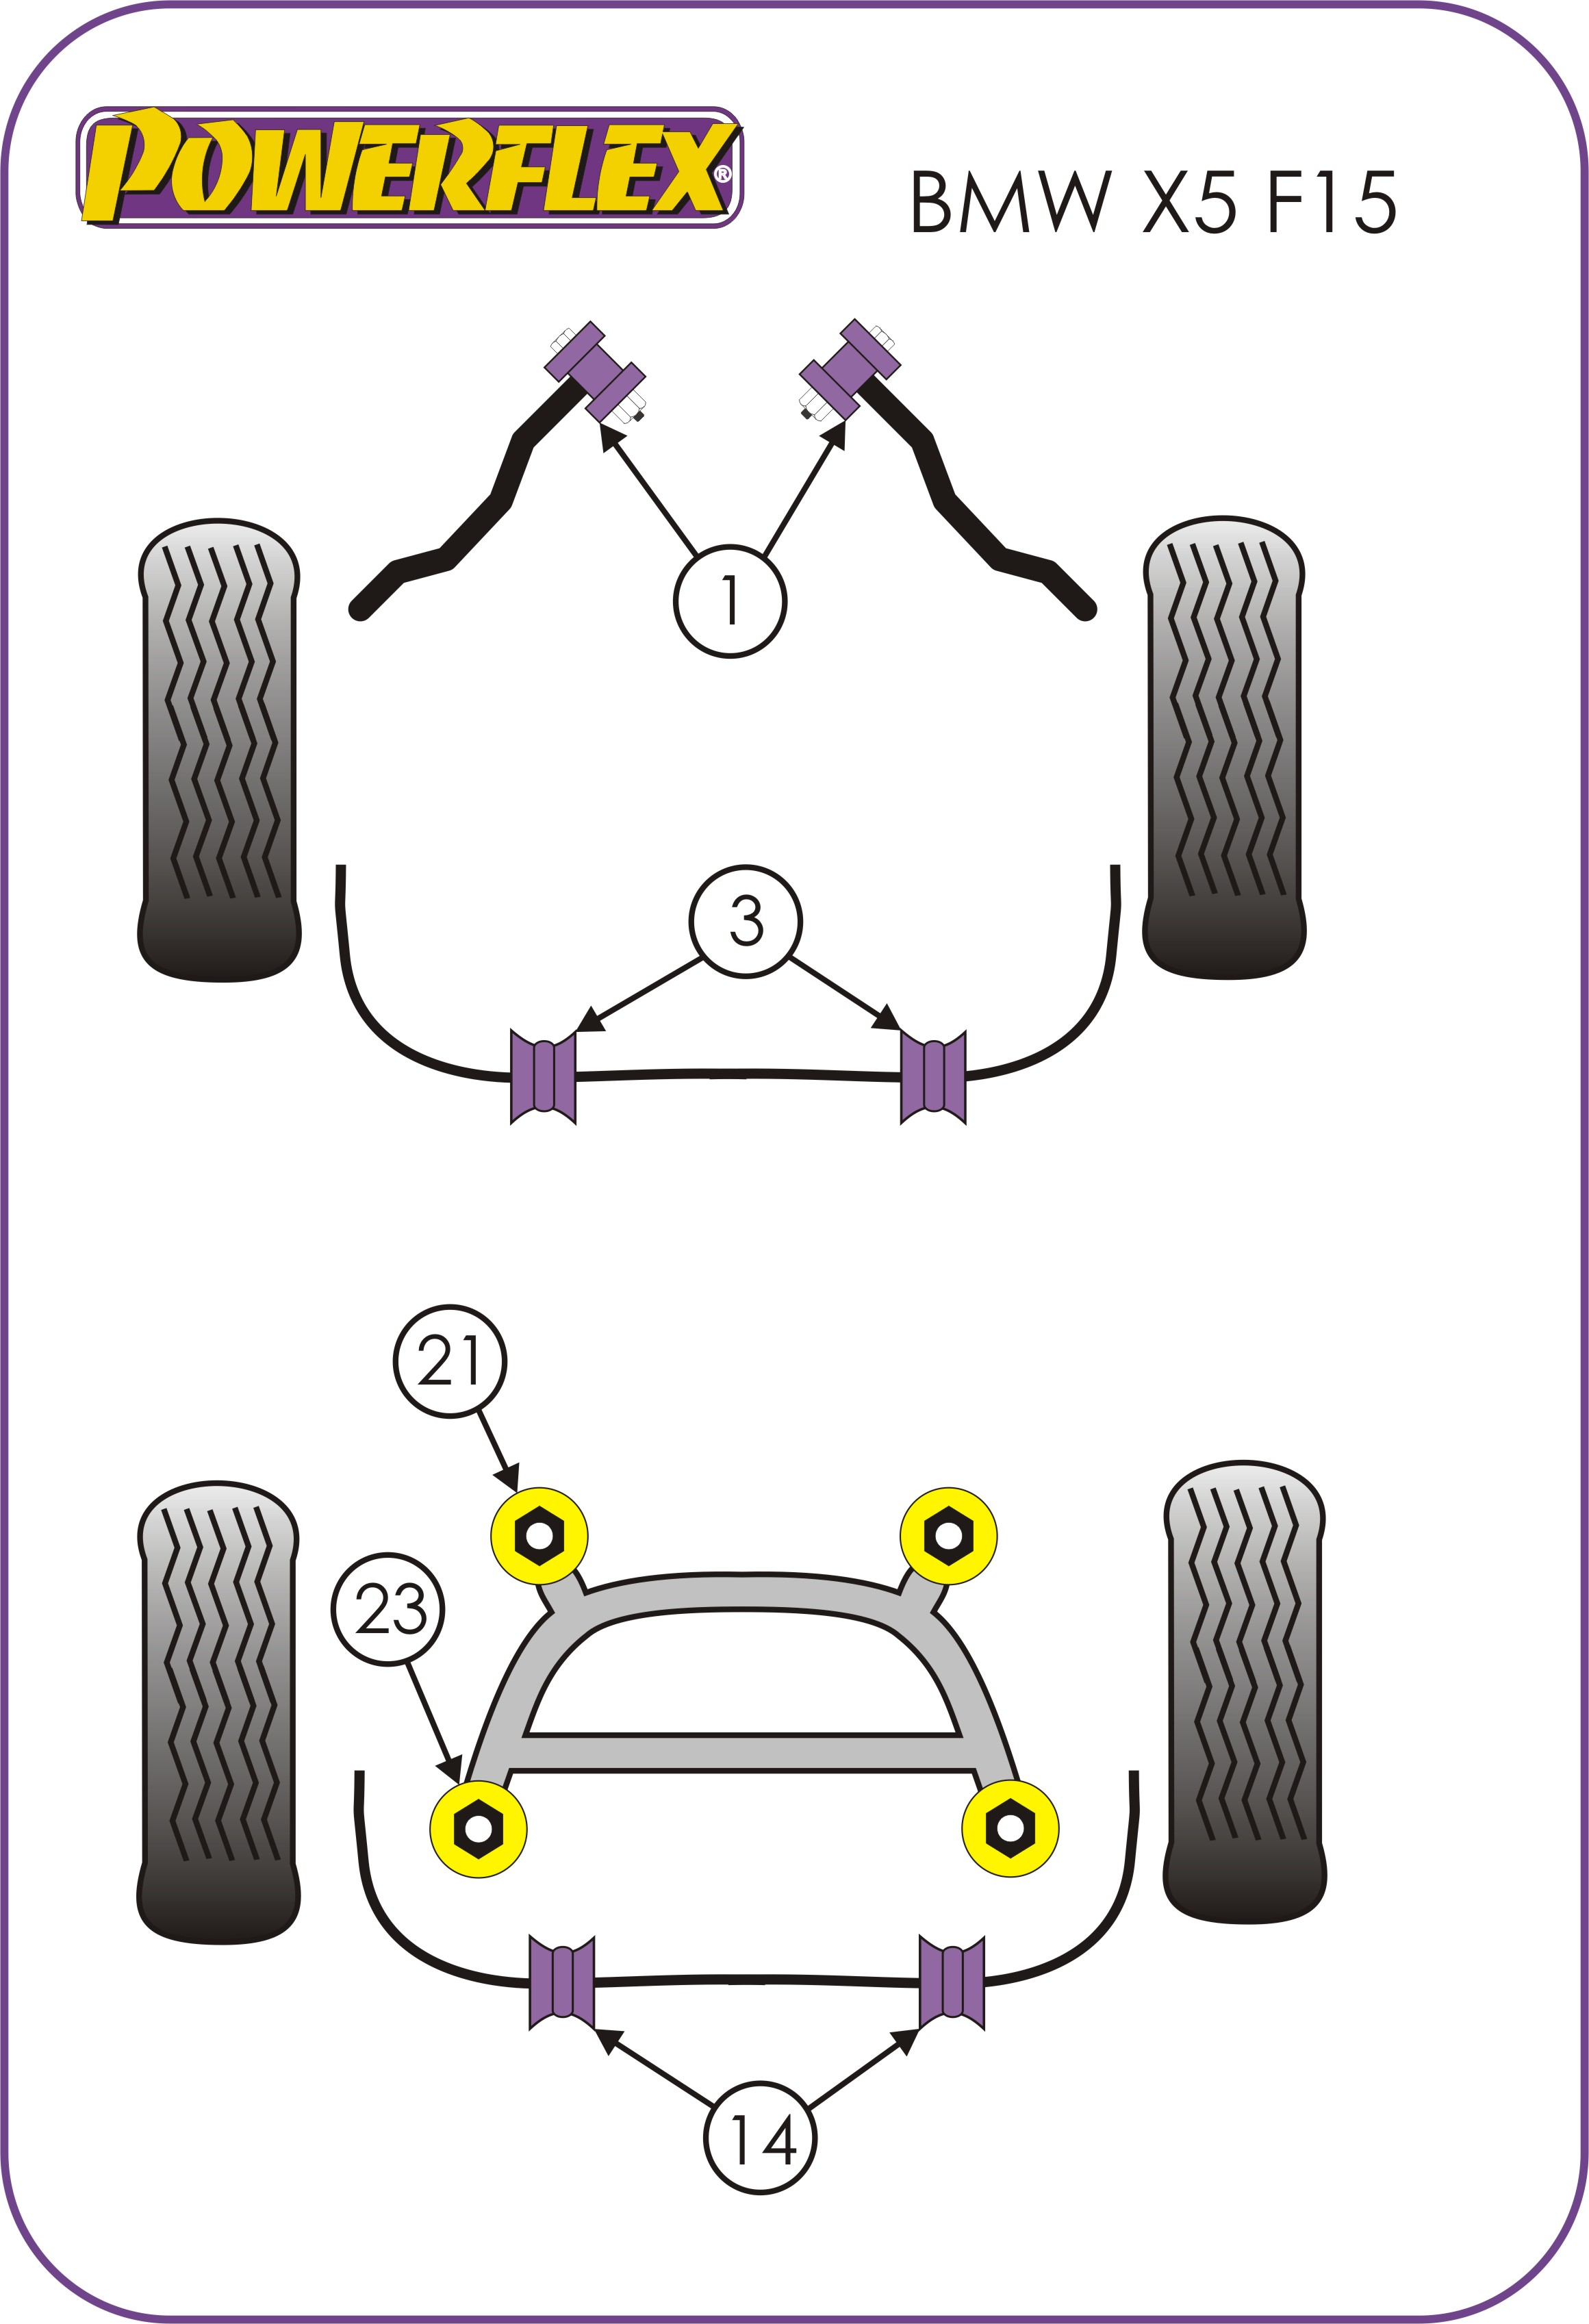 Powerflex Polyurethane Suspension Bushes Caterham Bmw E28 Engine Diagram X5 F15